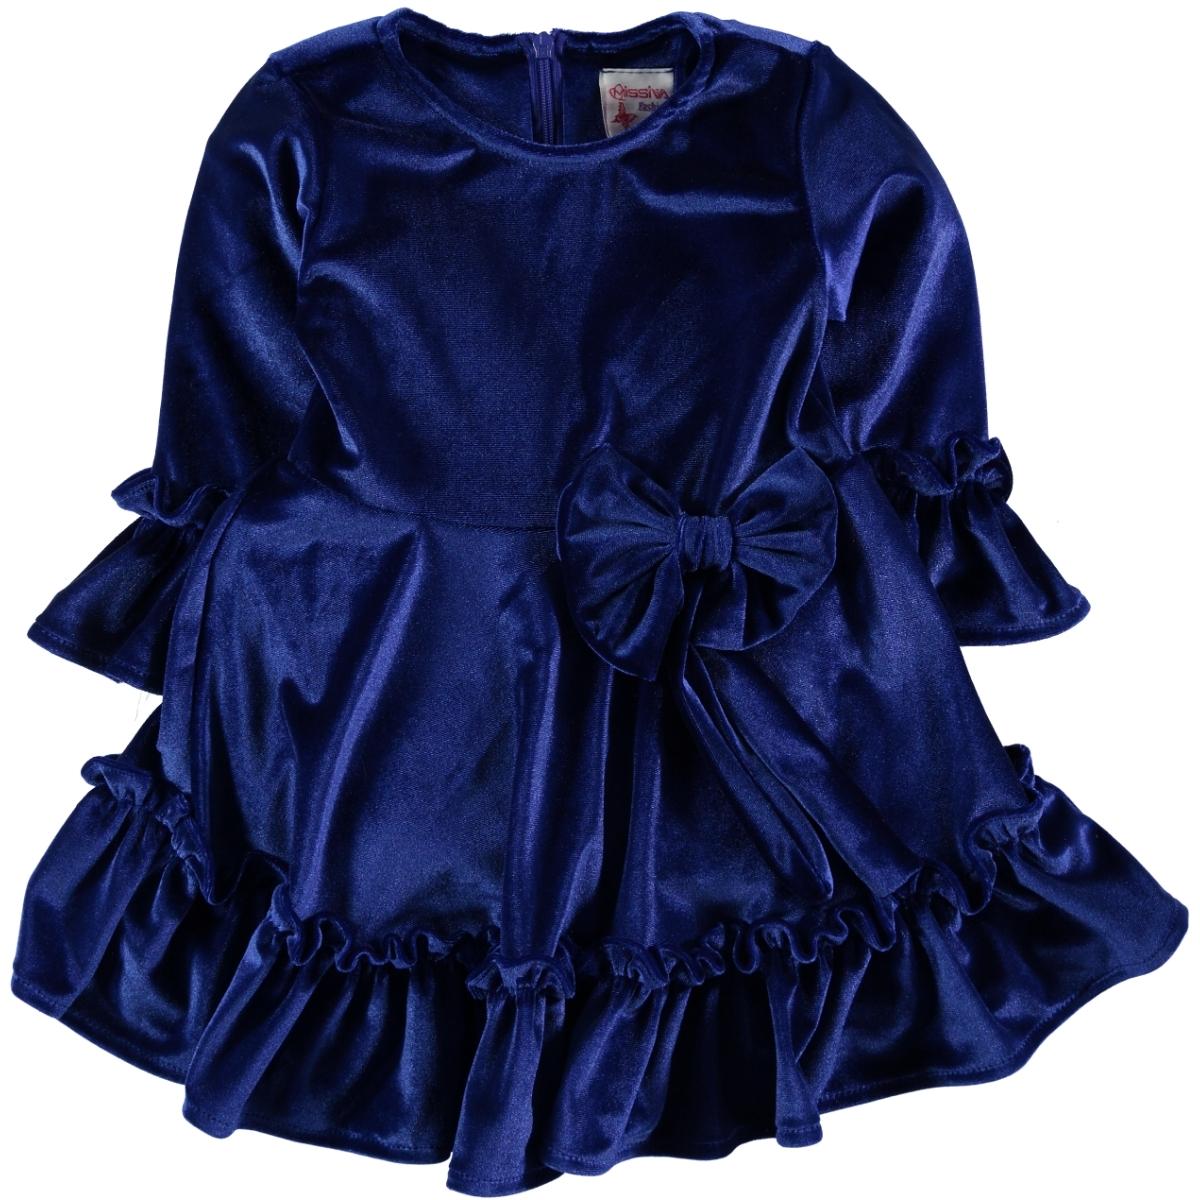 Missiva Girl Clothes Age 6-9 Boy Blue Saks